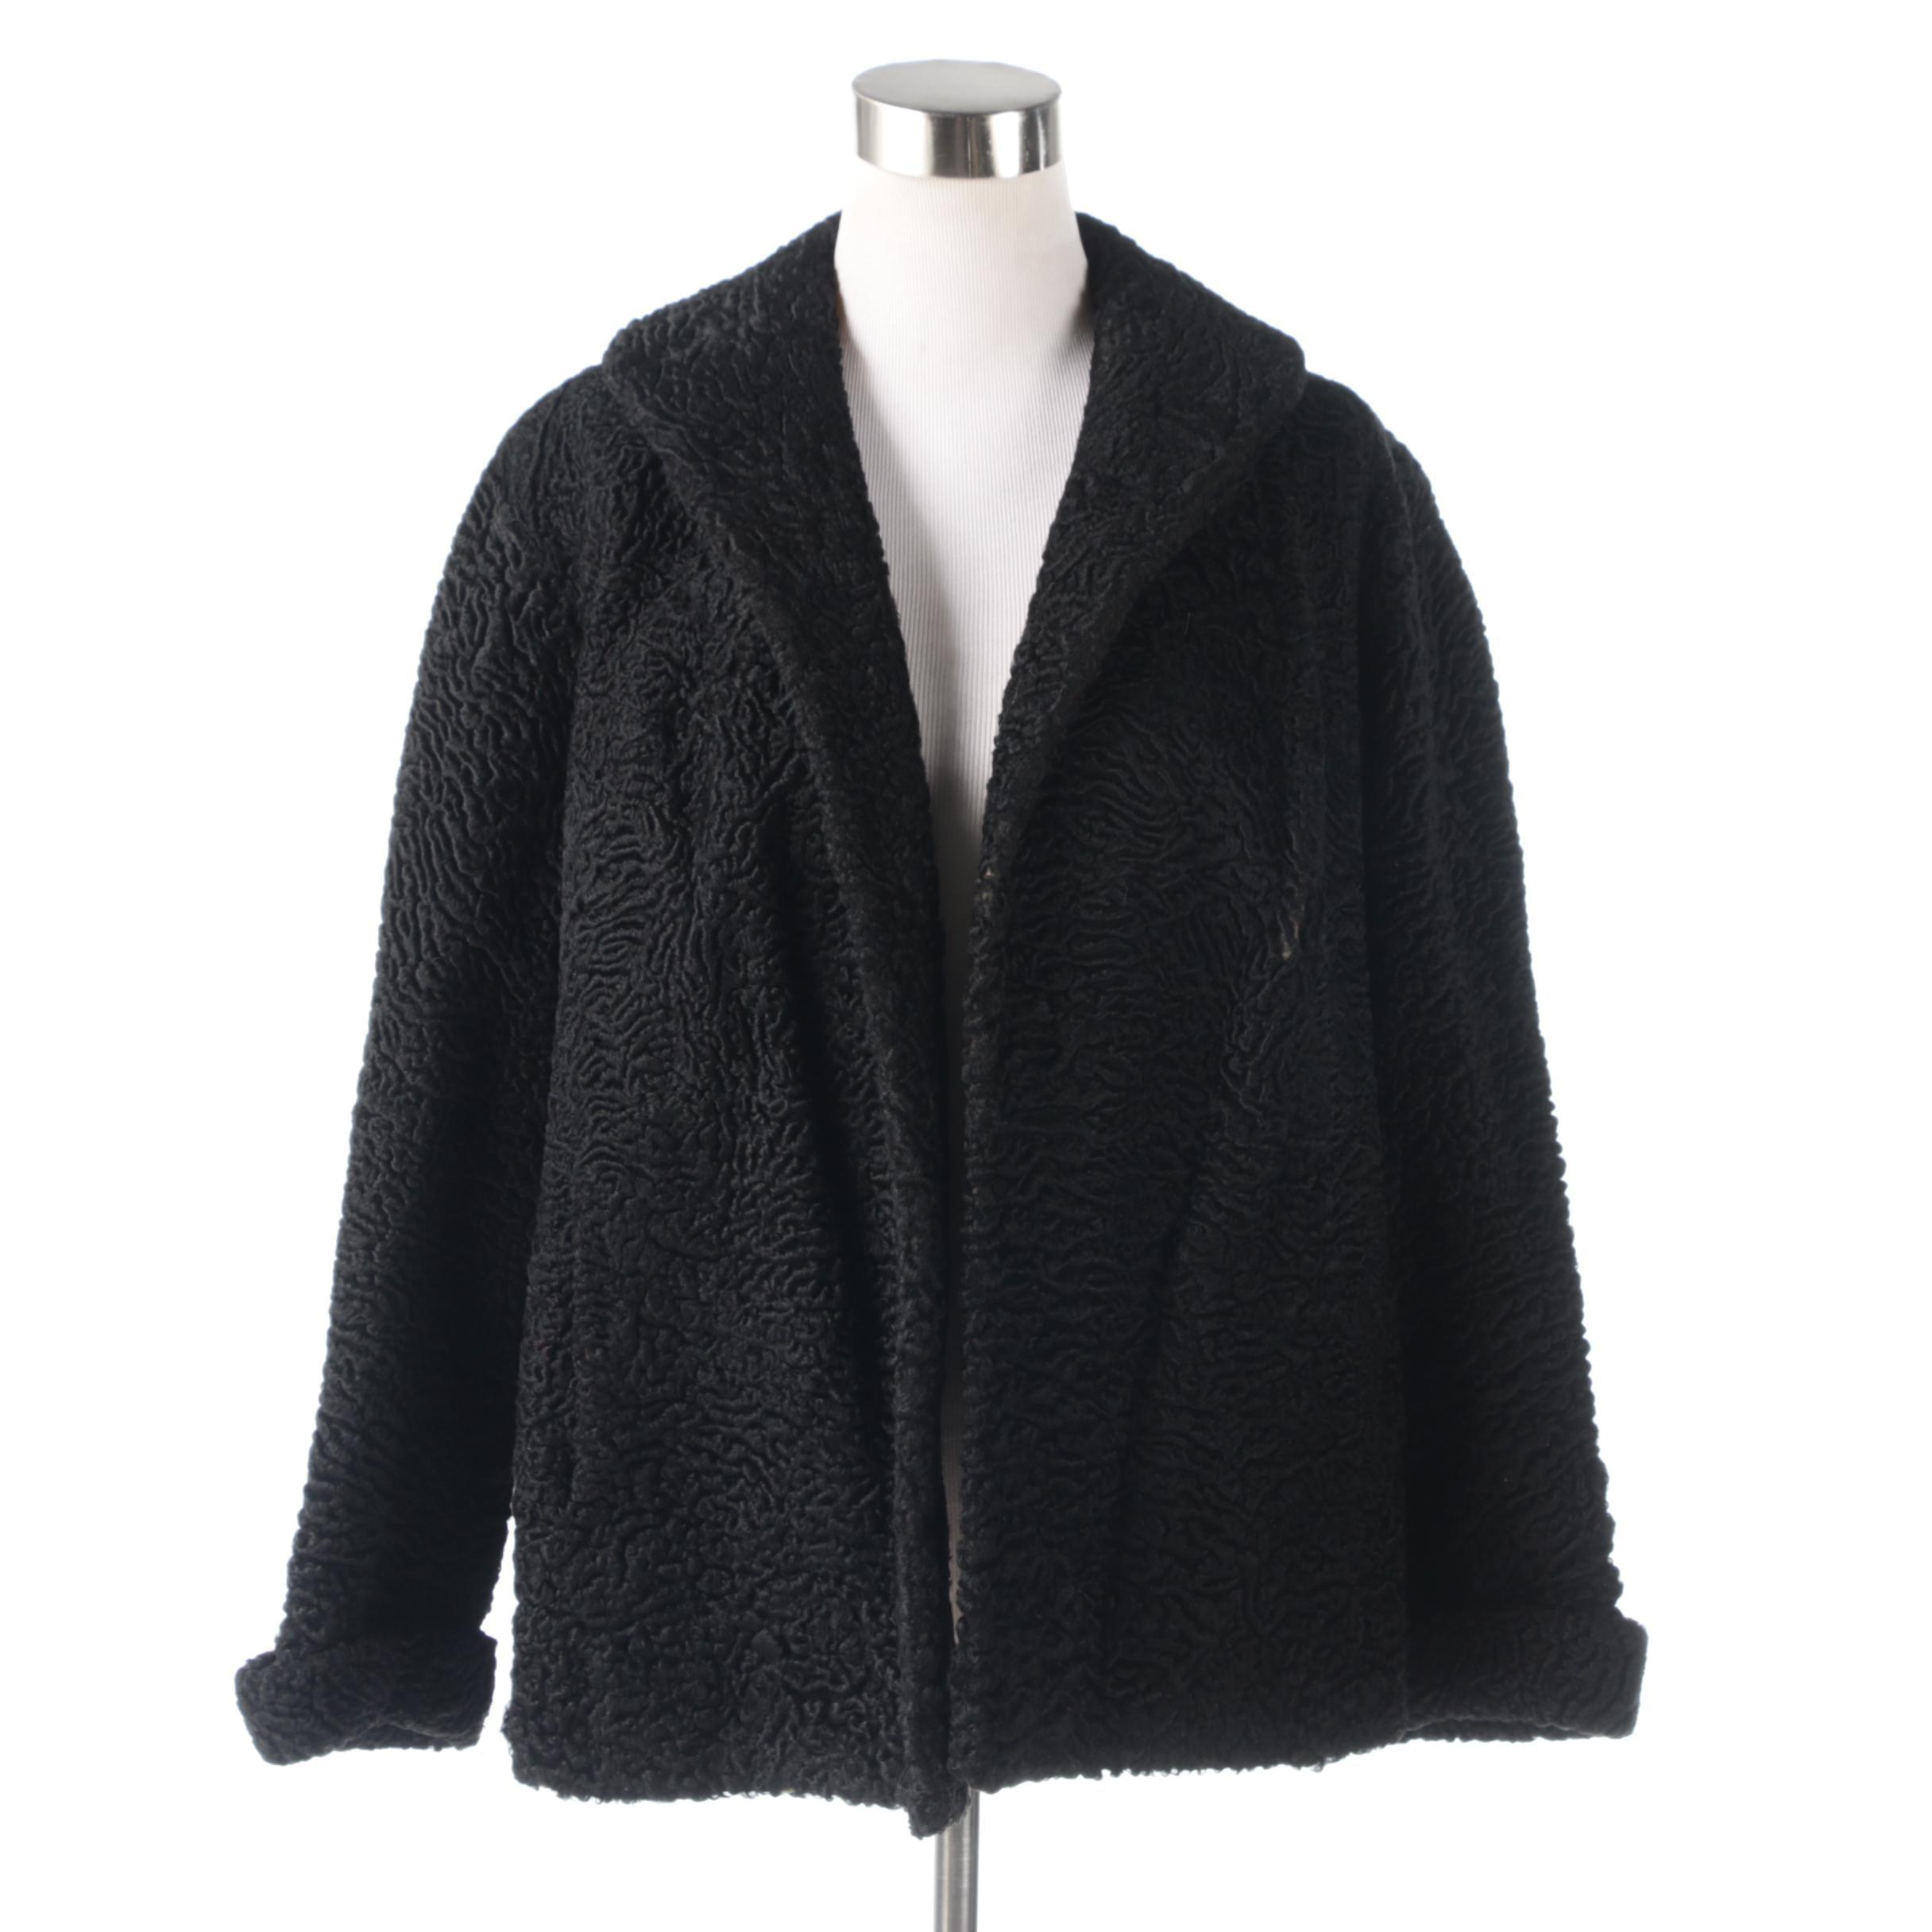 Schiaparelli Paris Black Persian Lamb Fur Coat, 1950s Vintage